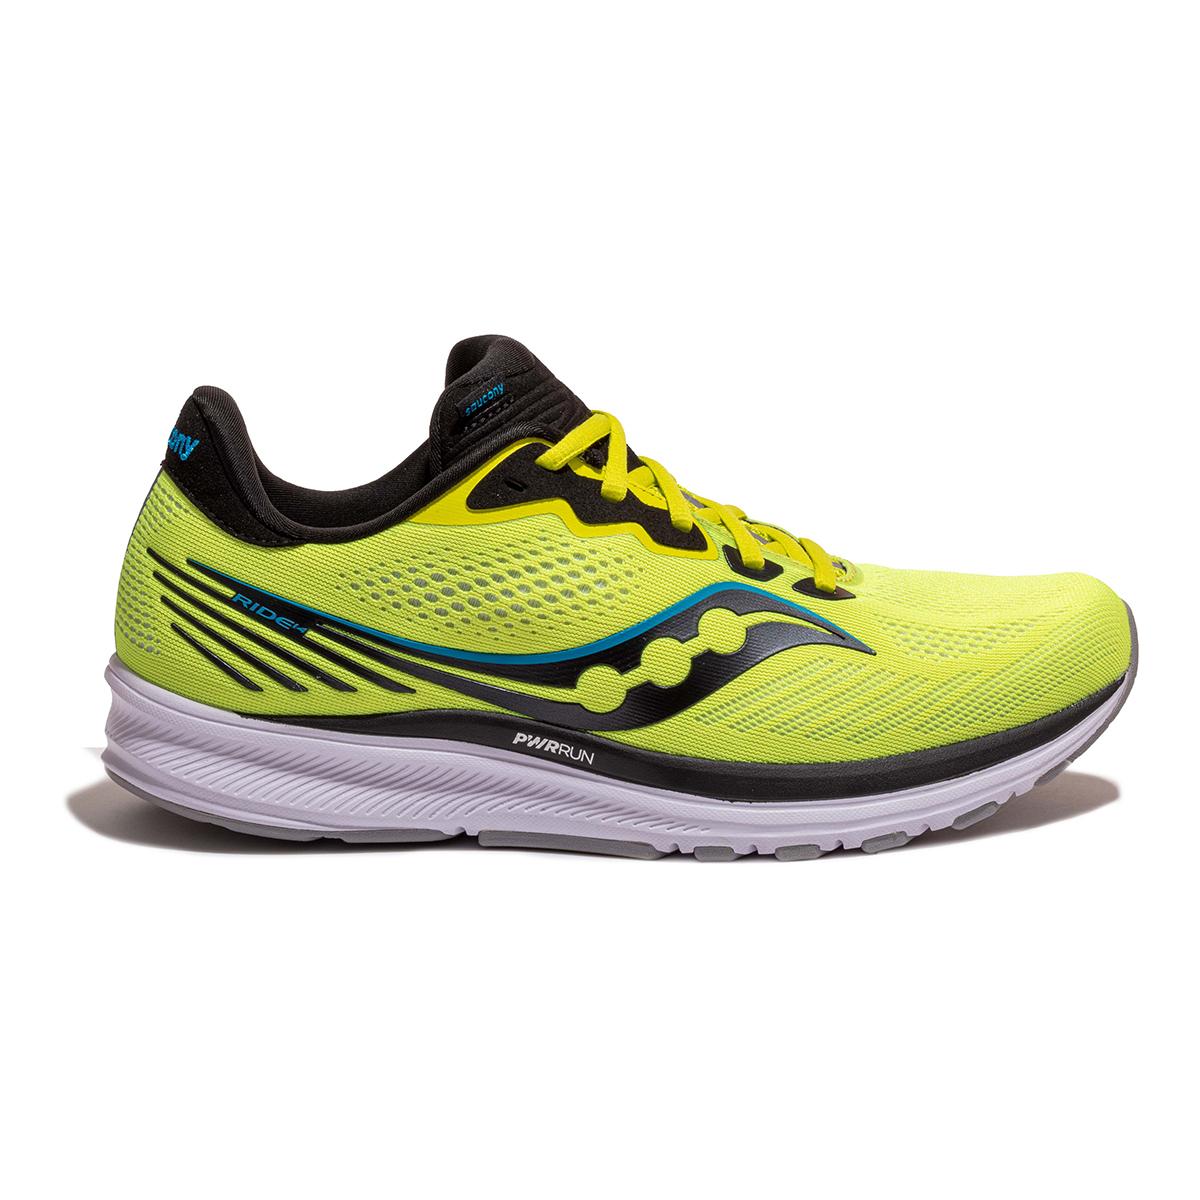 Men's Saucony Ride 14 Running Shoe - Color: Citrus / Black - Size: 7 - Width: Regular, Citrus / Black, large, image 1